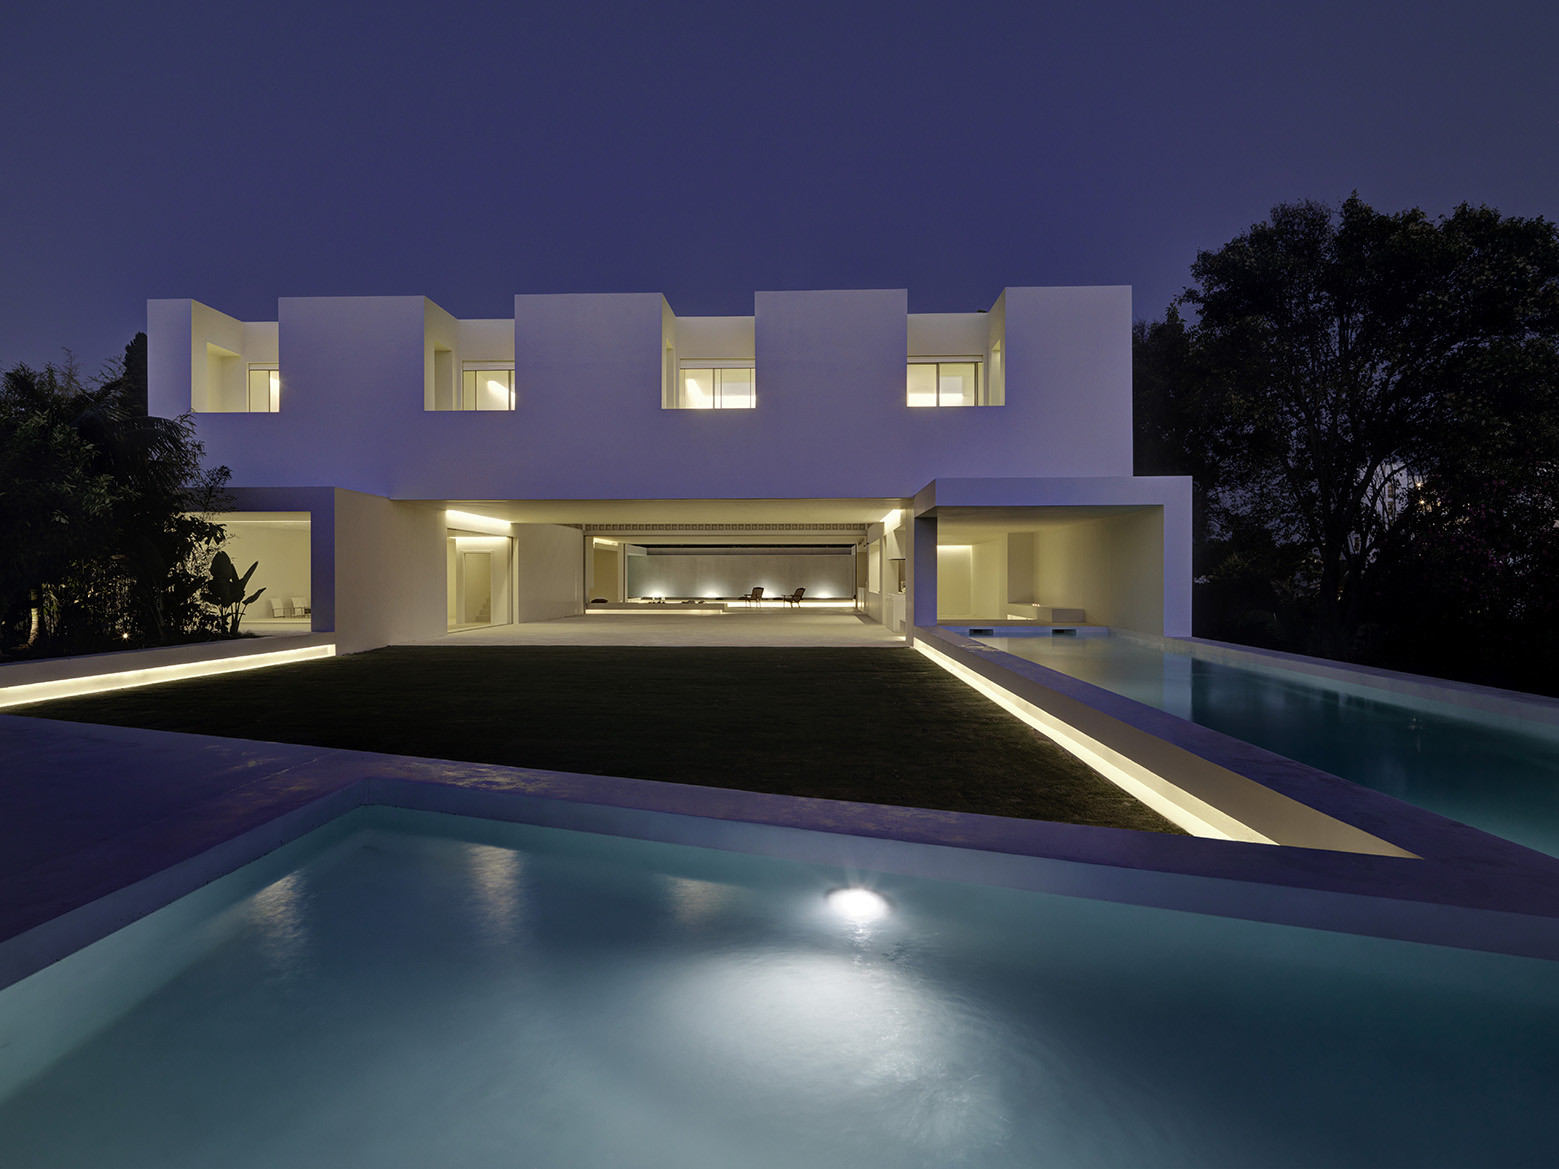 los limoneros residence by gus w stemann in marbella spain